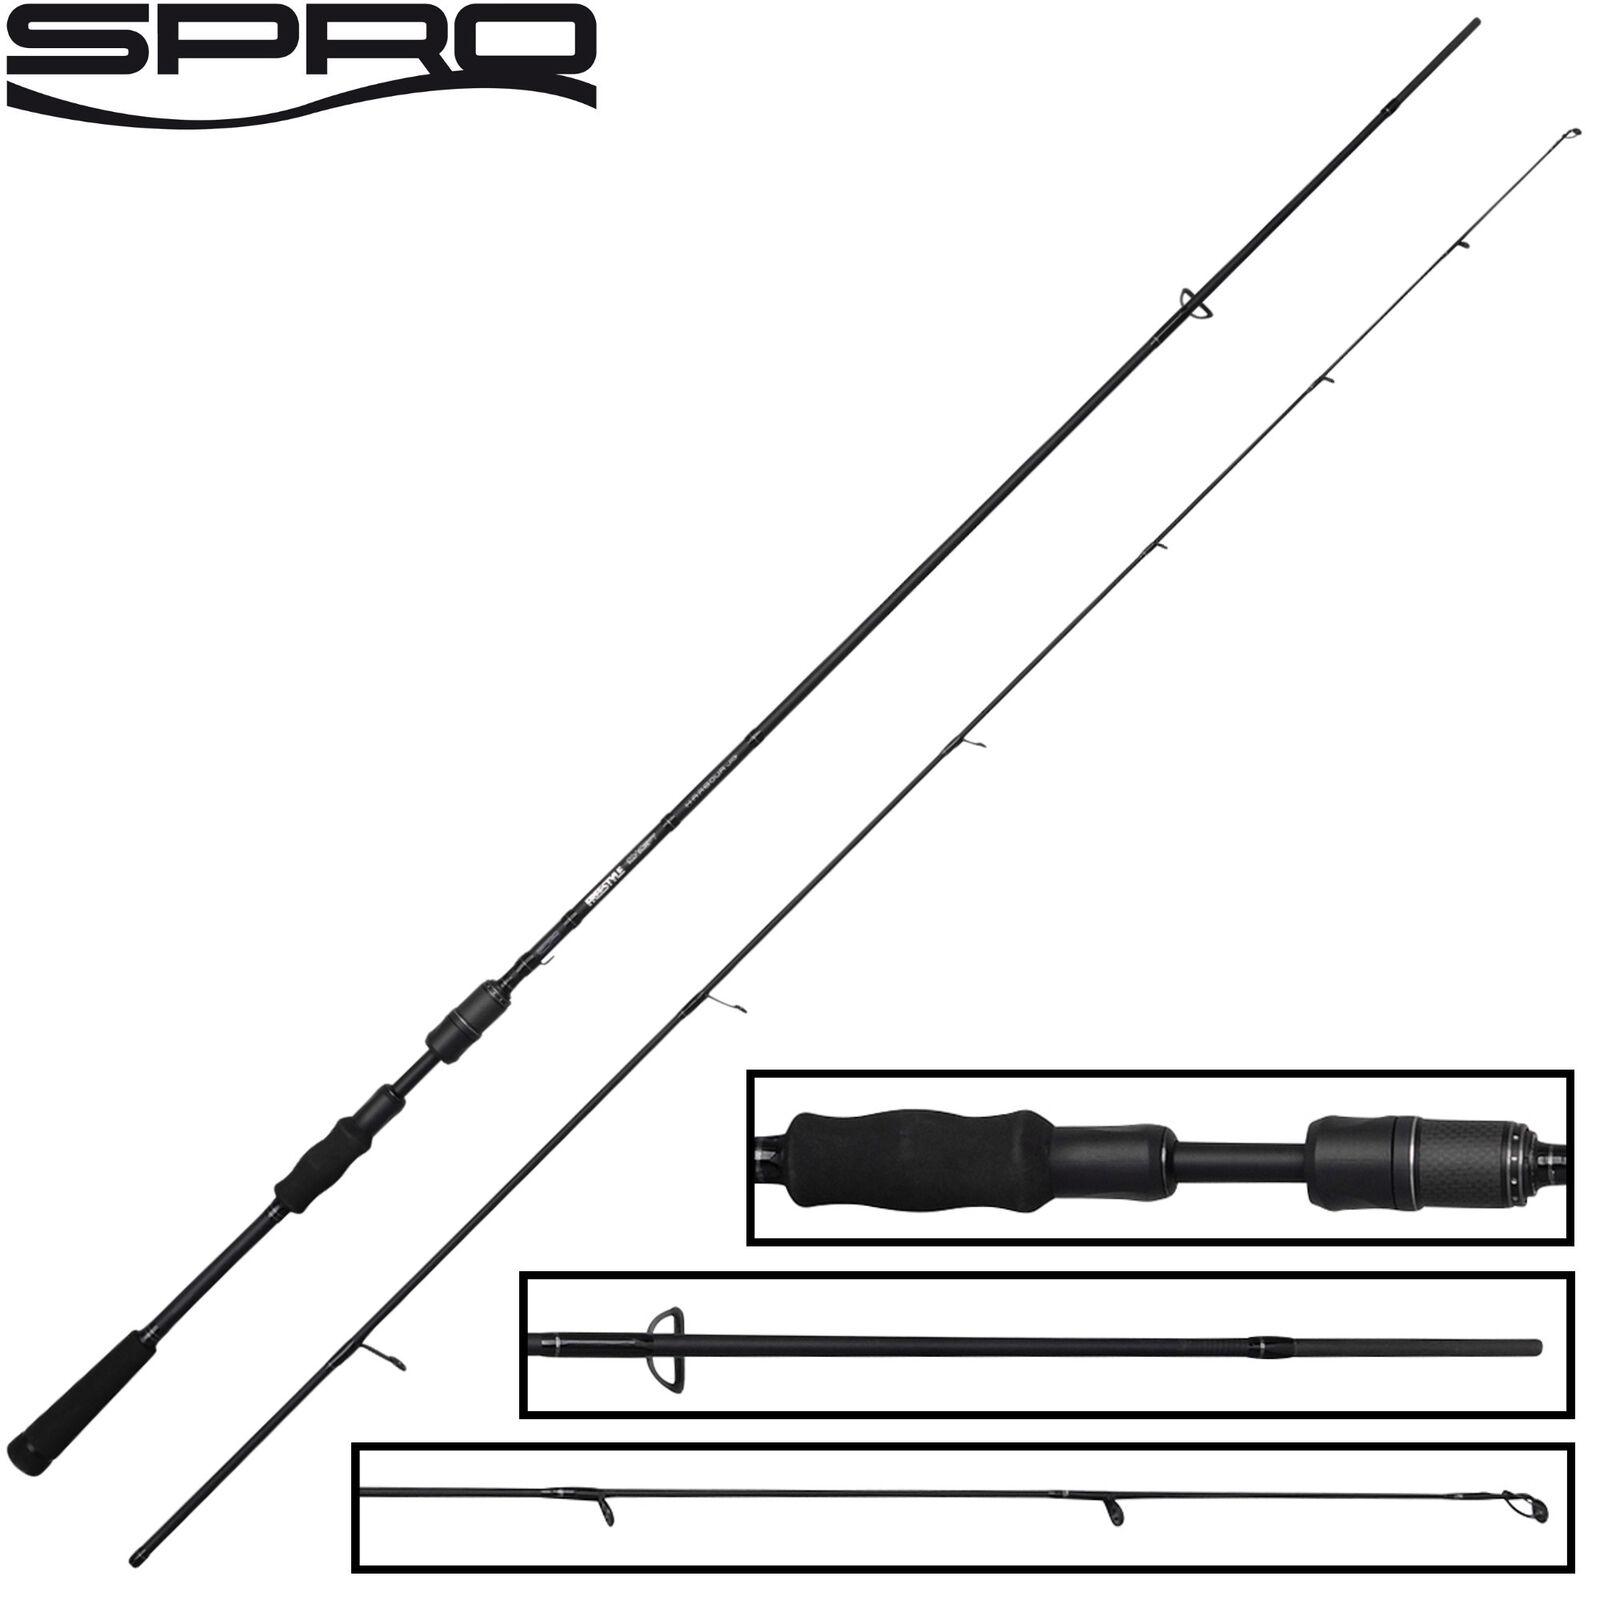 Spro Freestyle Concept Harbour 2,10m 14-48g 14-48g 14-48g - Spinnrute, Streetfishing Rute fccc15